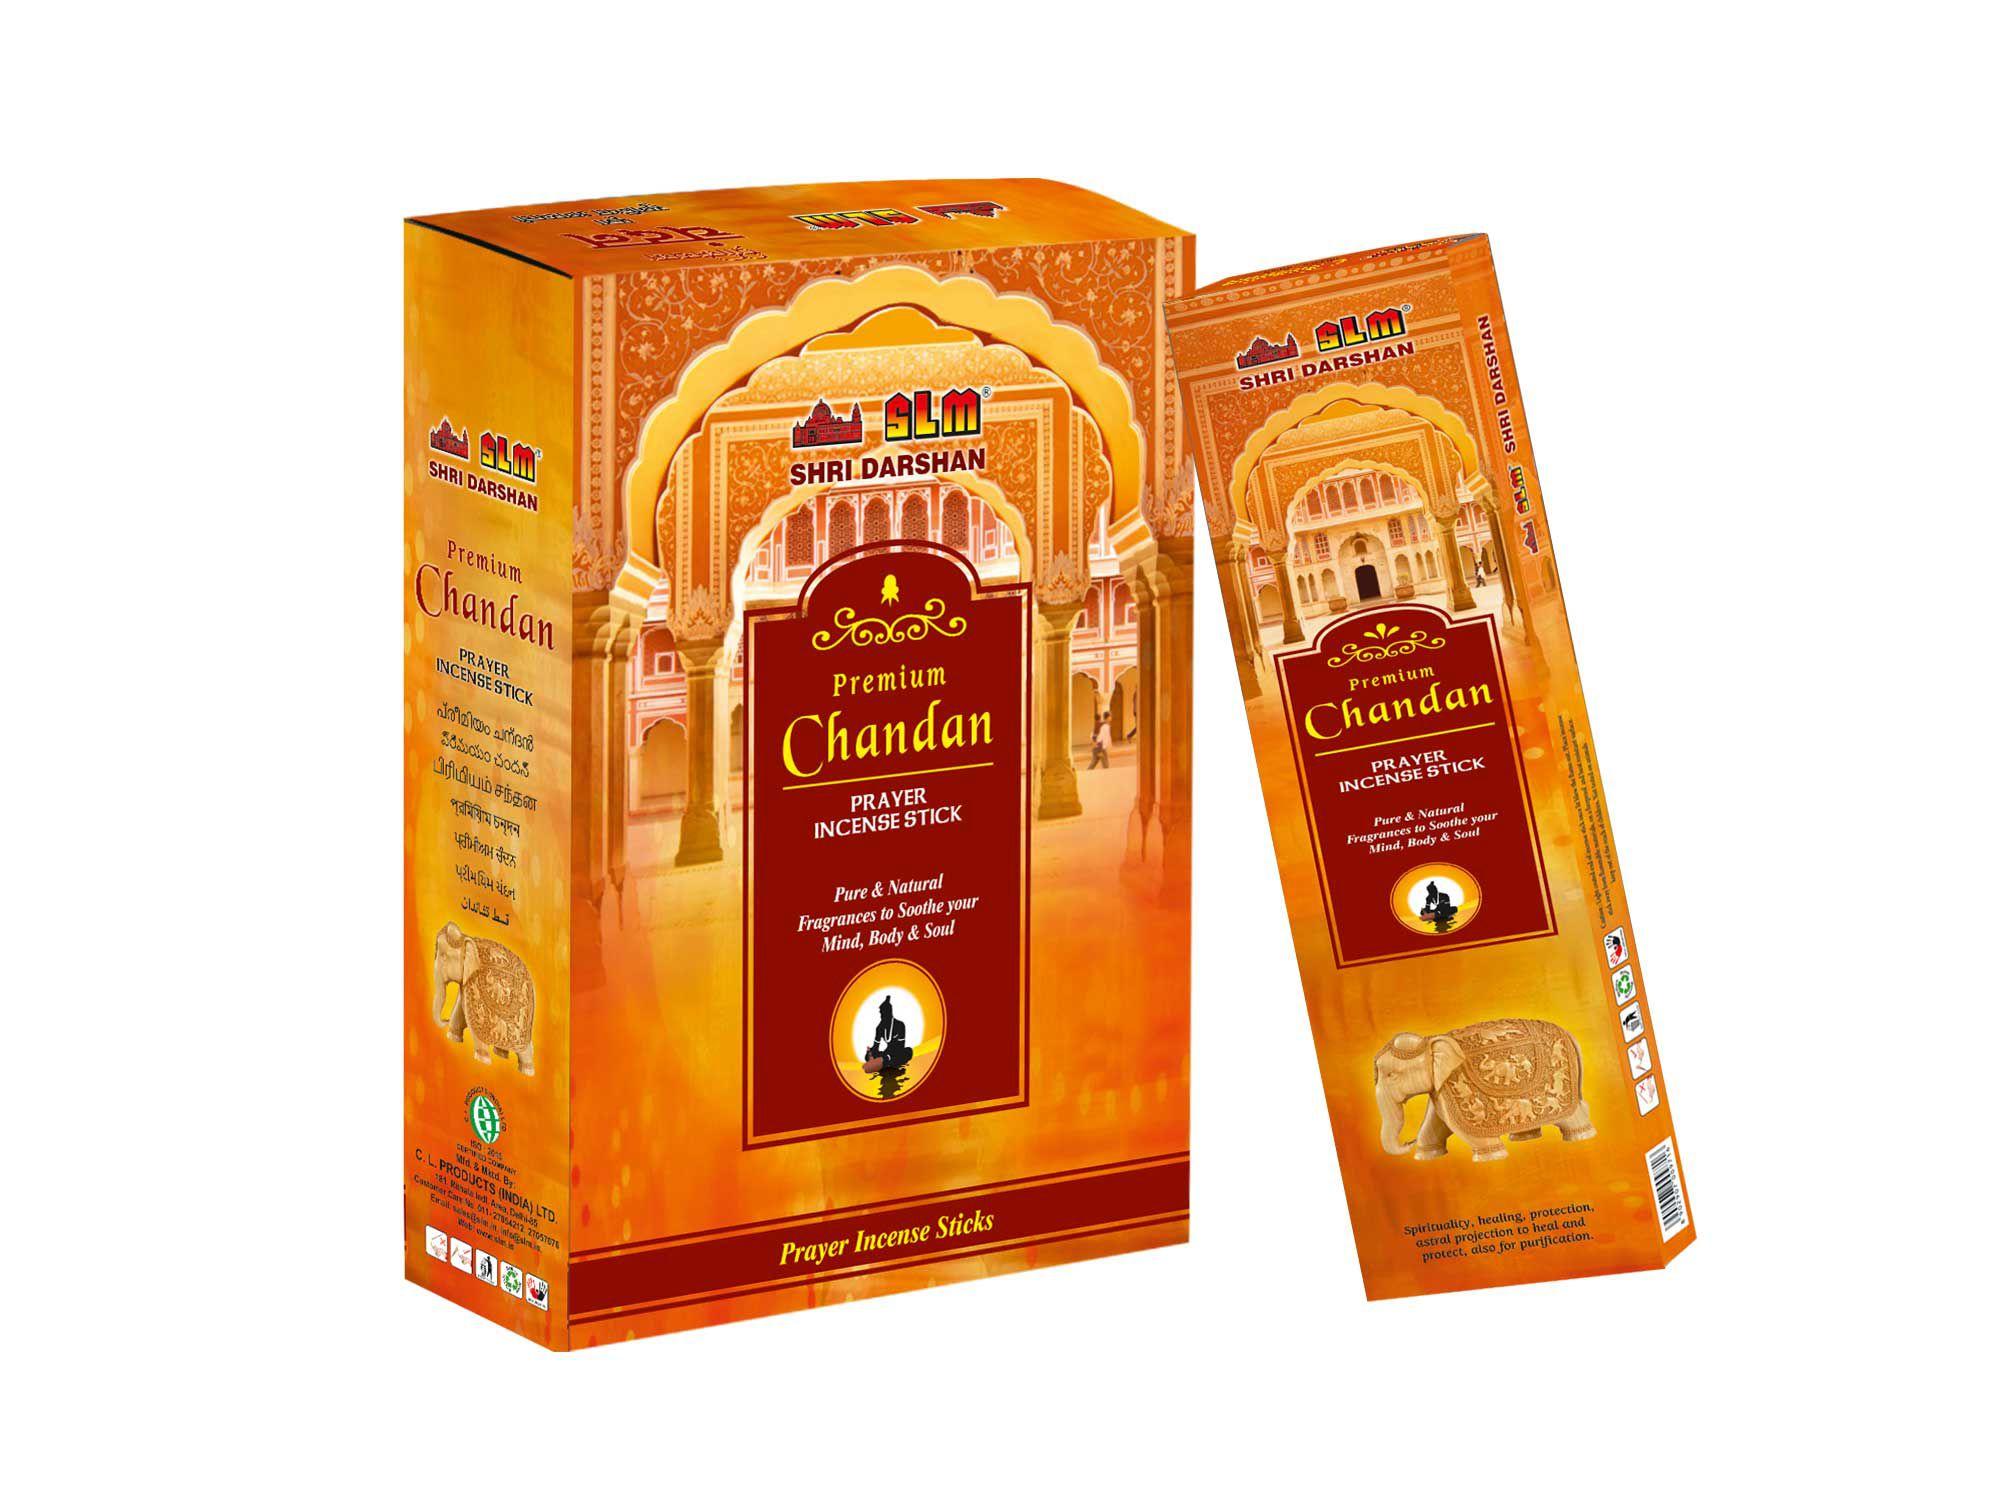 SLM Chandan Incense Stick